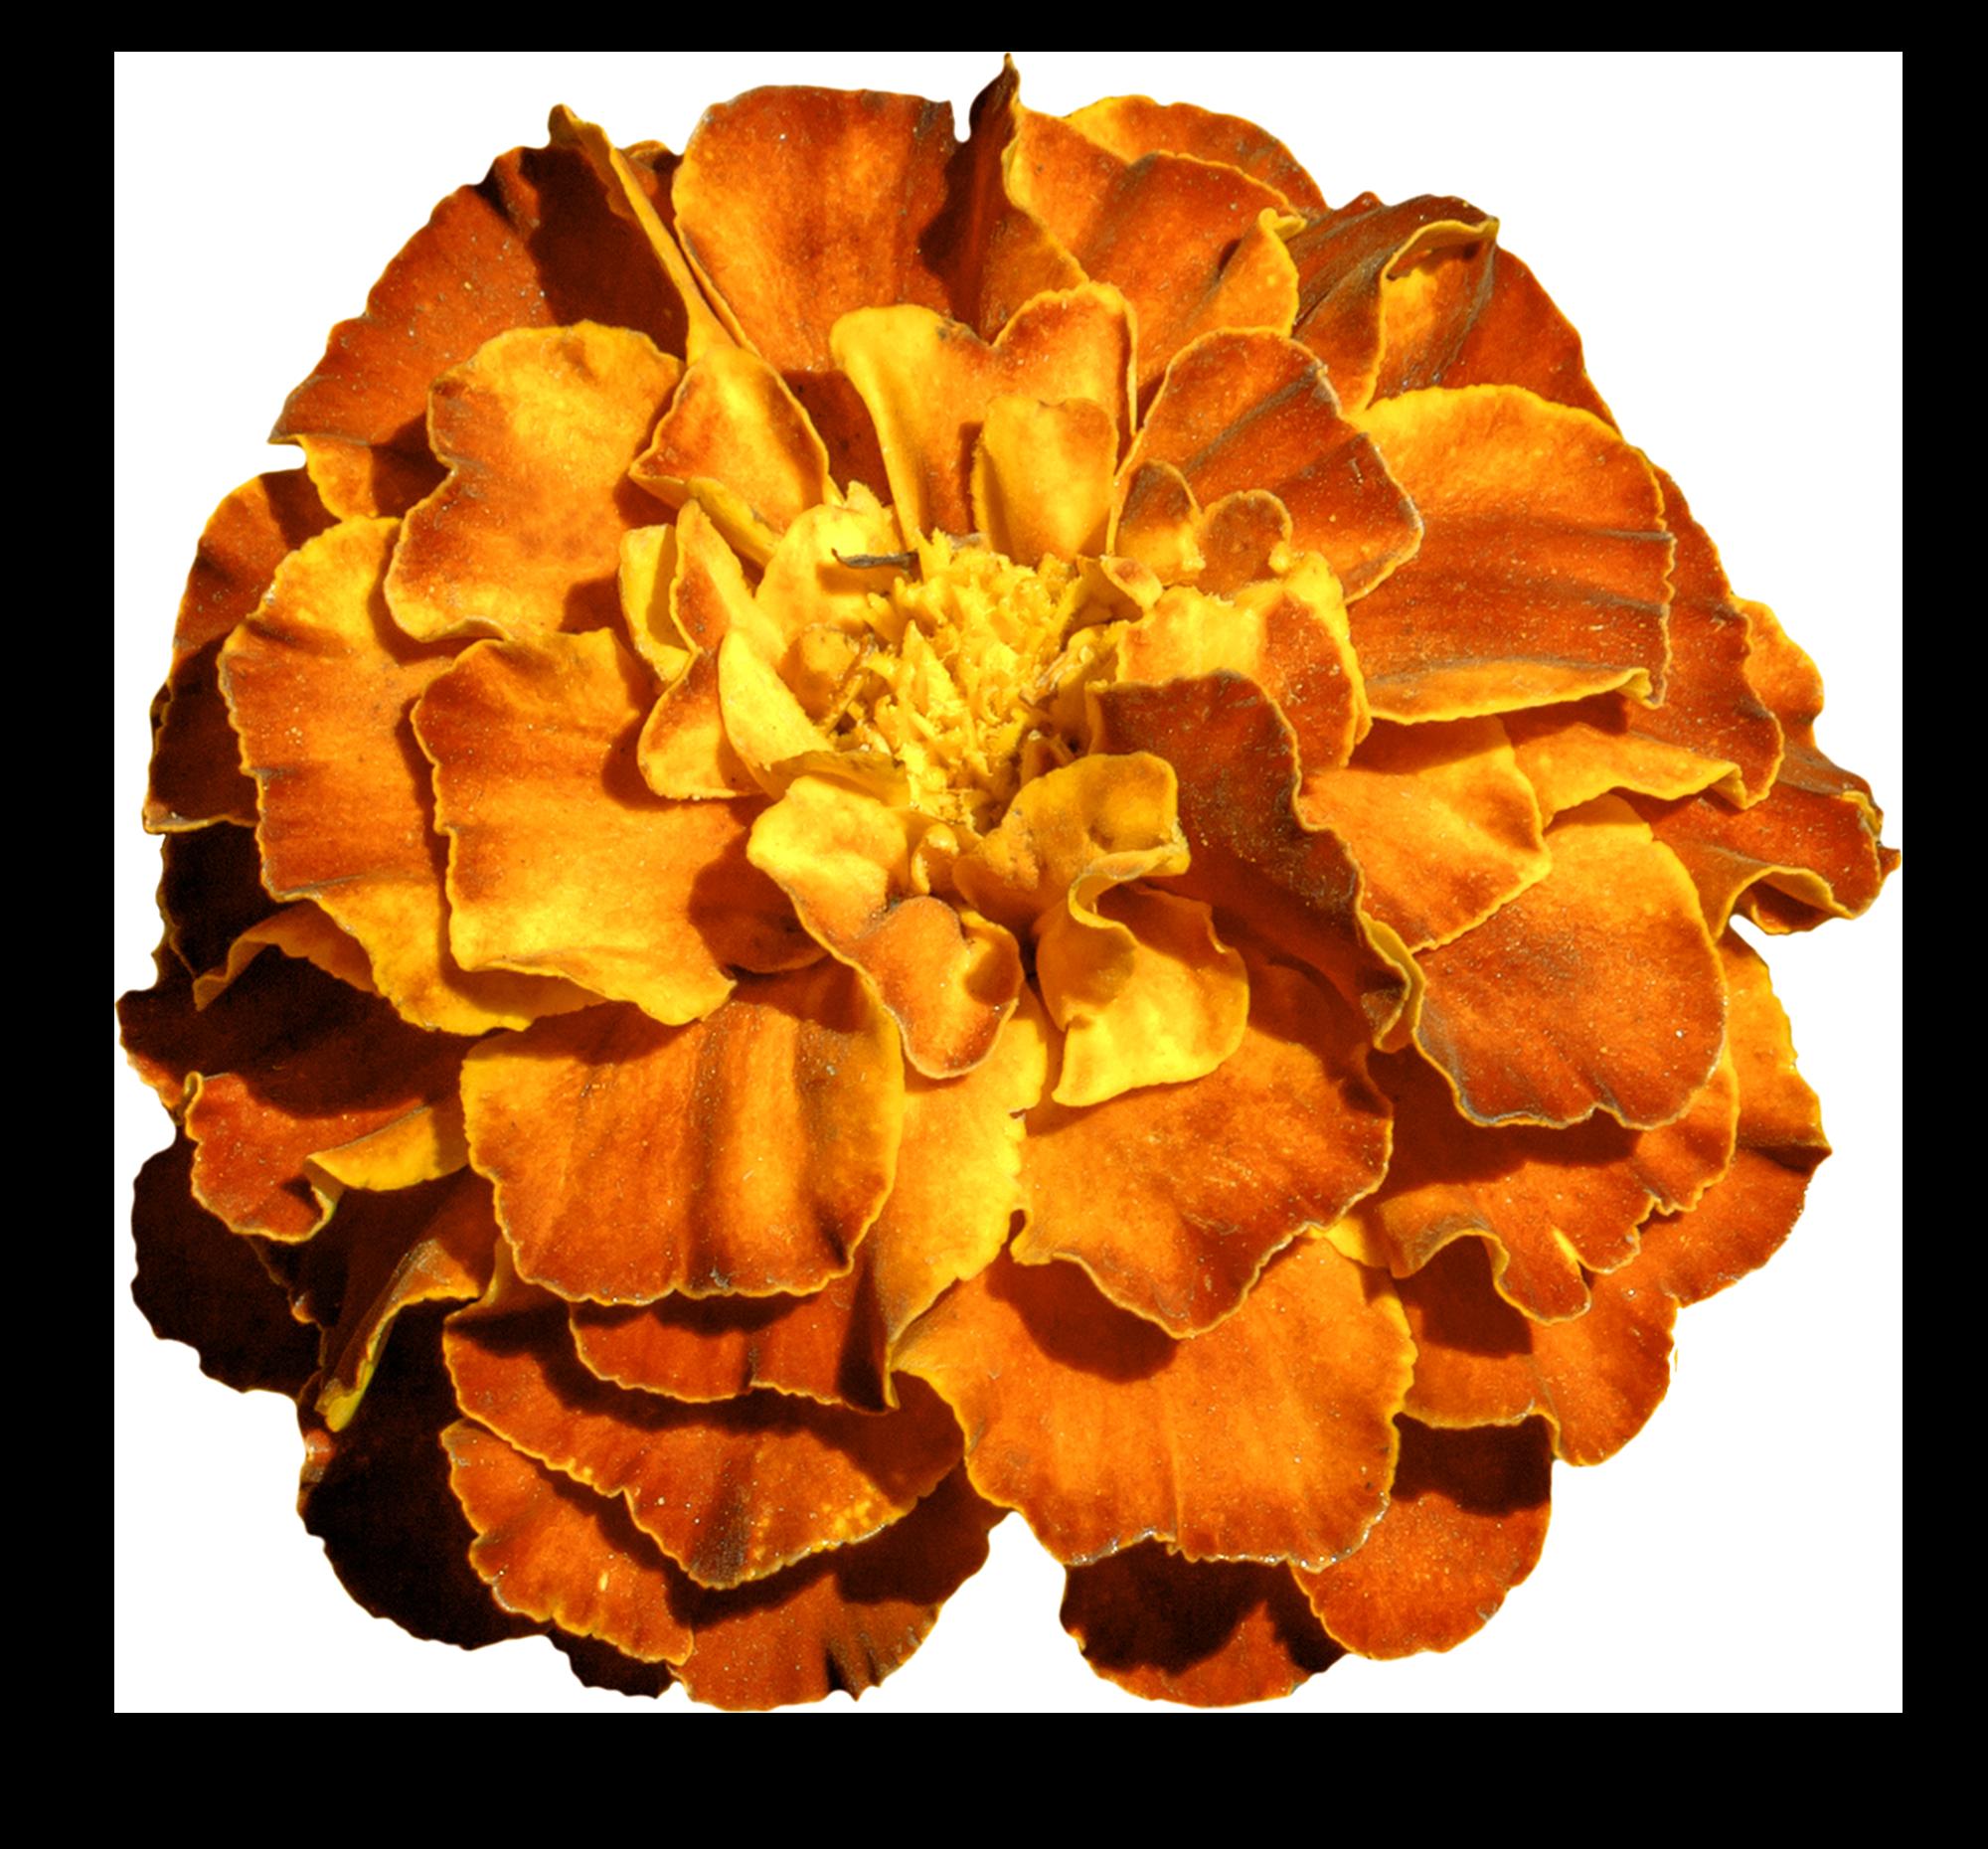 photo of a single marigold